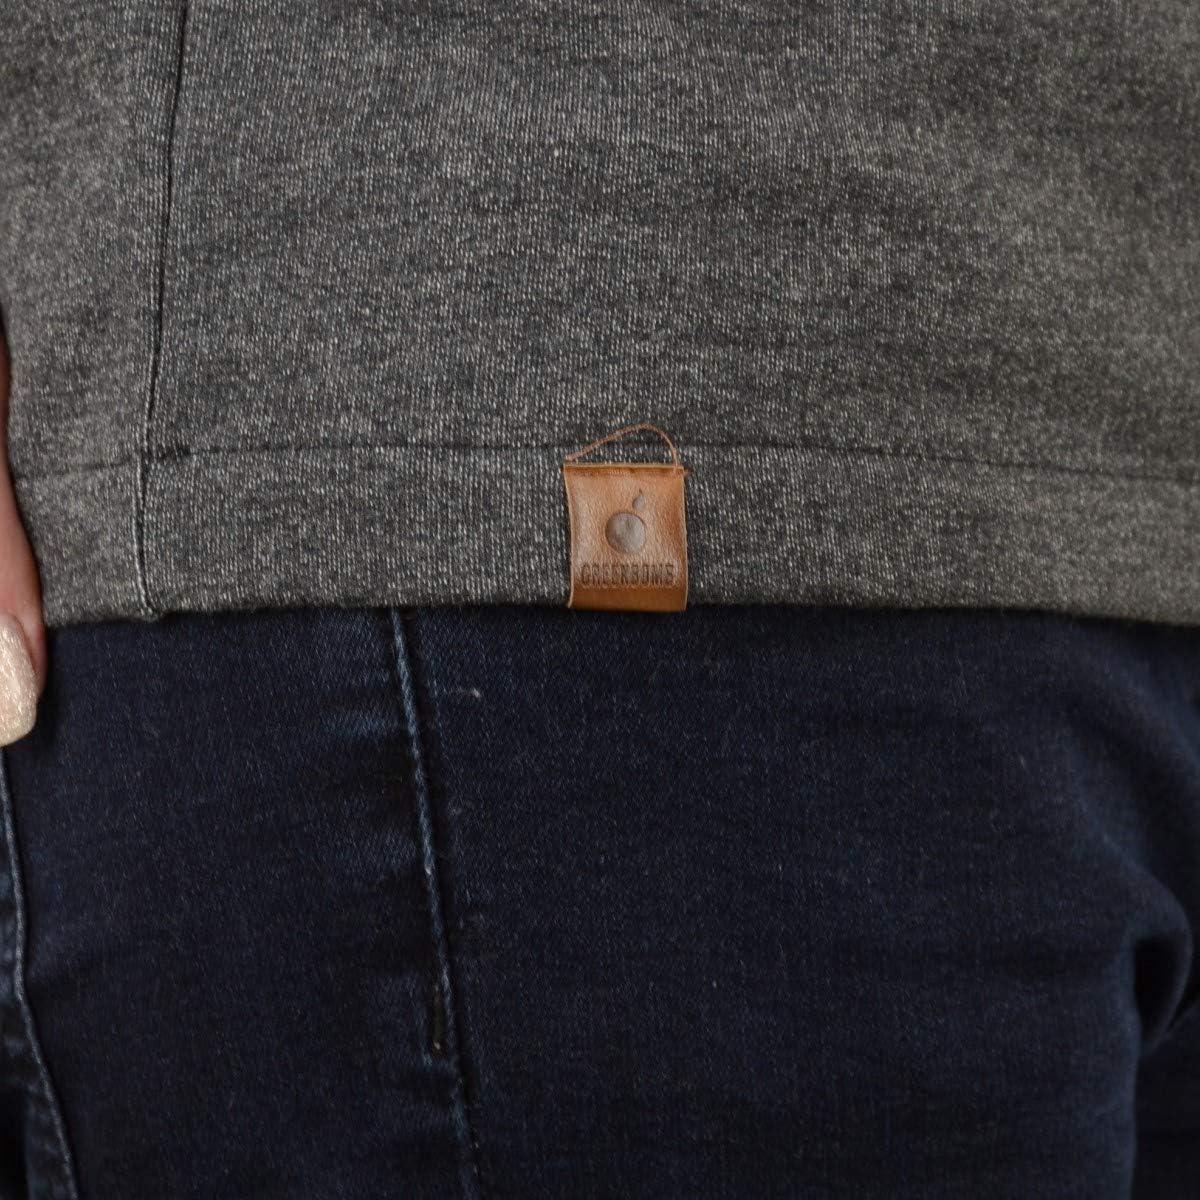 Greenbomb Frauen Kapuzensweater Animal Swallows Air anthrazit Dunkelgrau Meliert